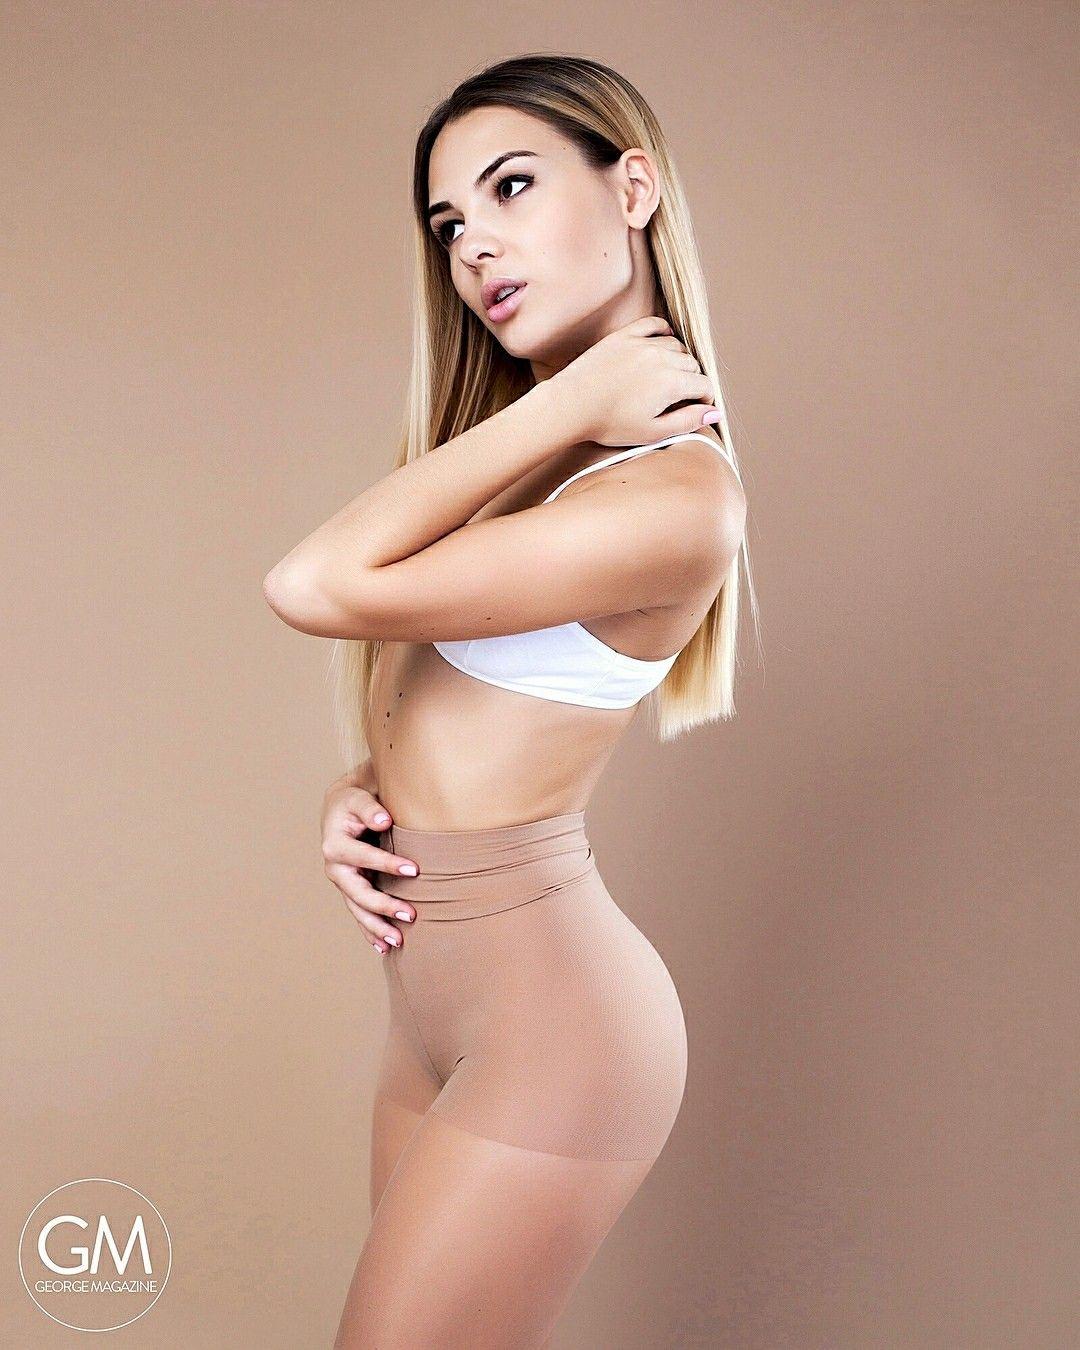 Tatiana georgieva photos работа для девушек клин